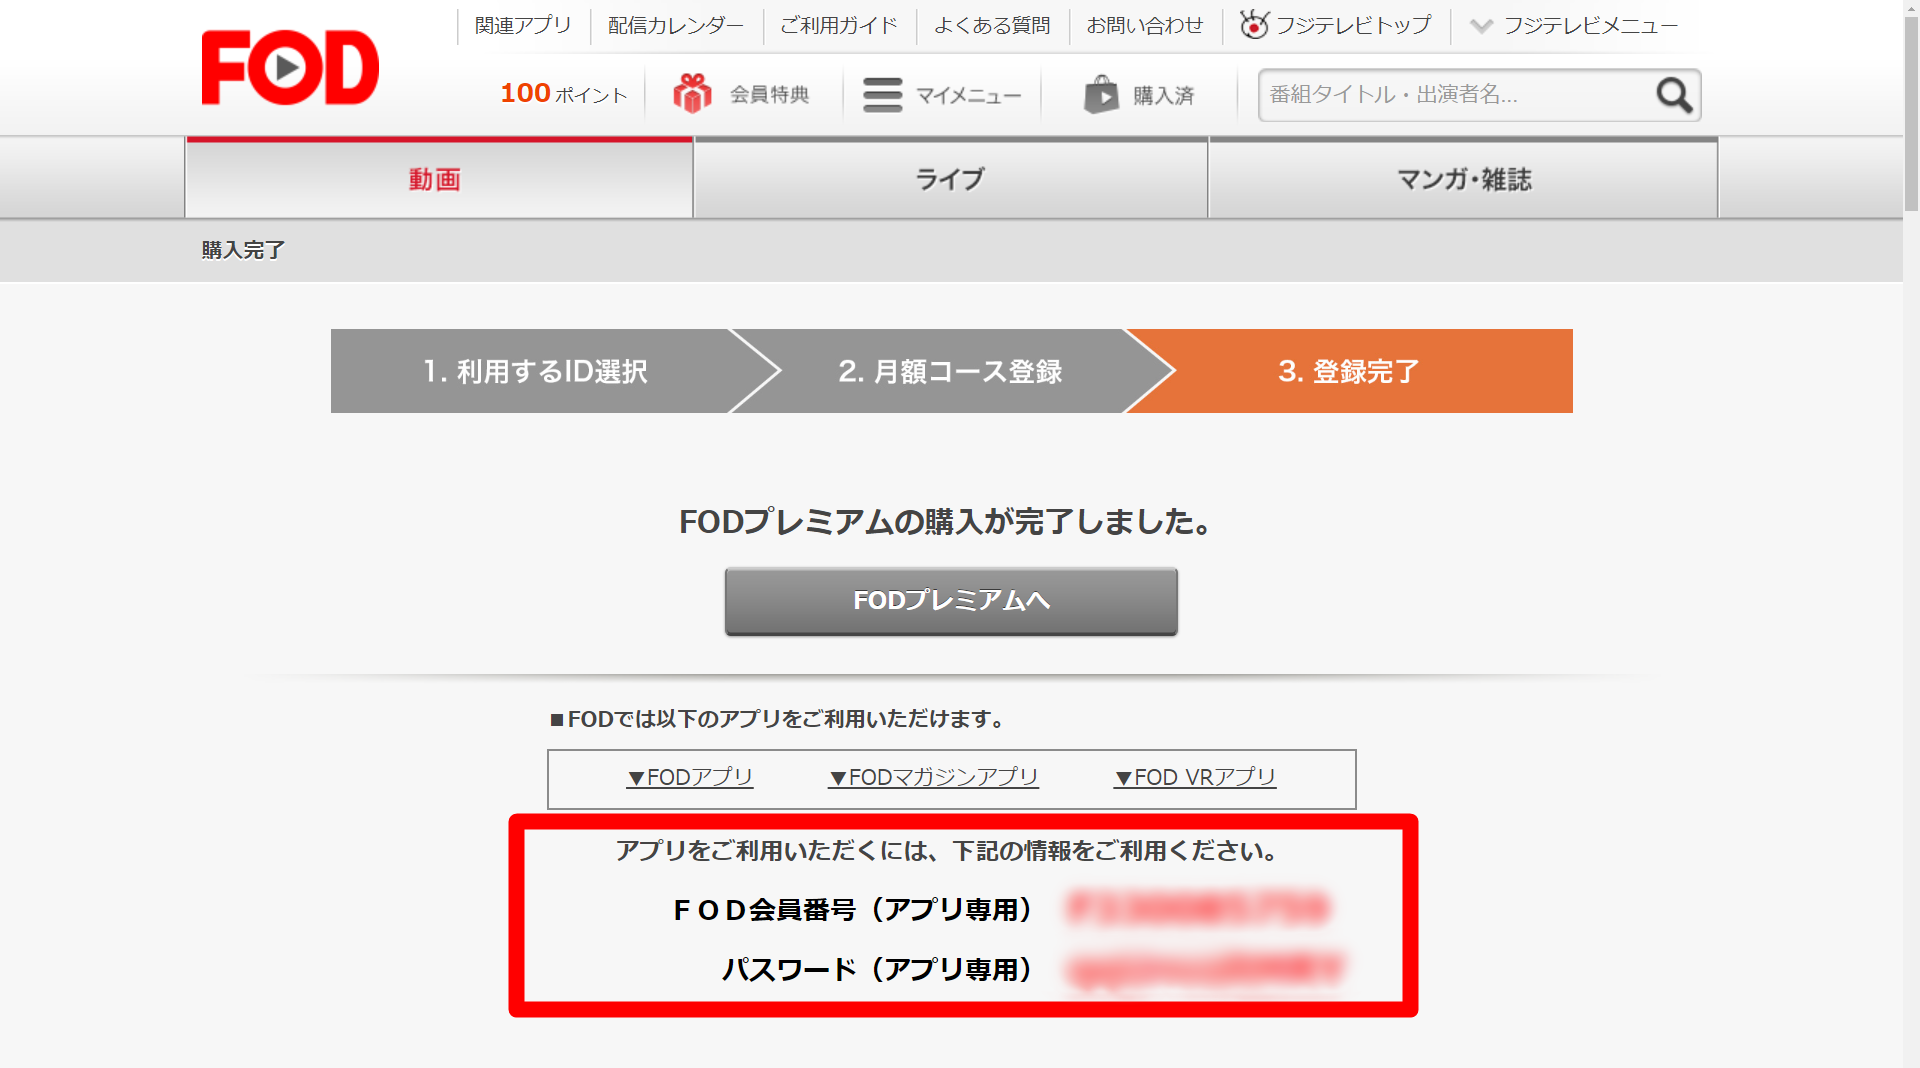 FOD登録8-2FODプレミアムへログイン アプリ